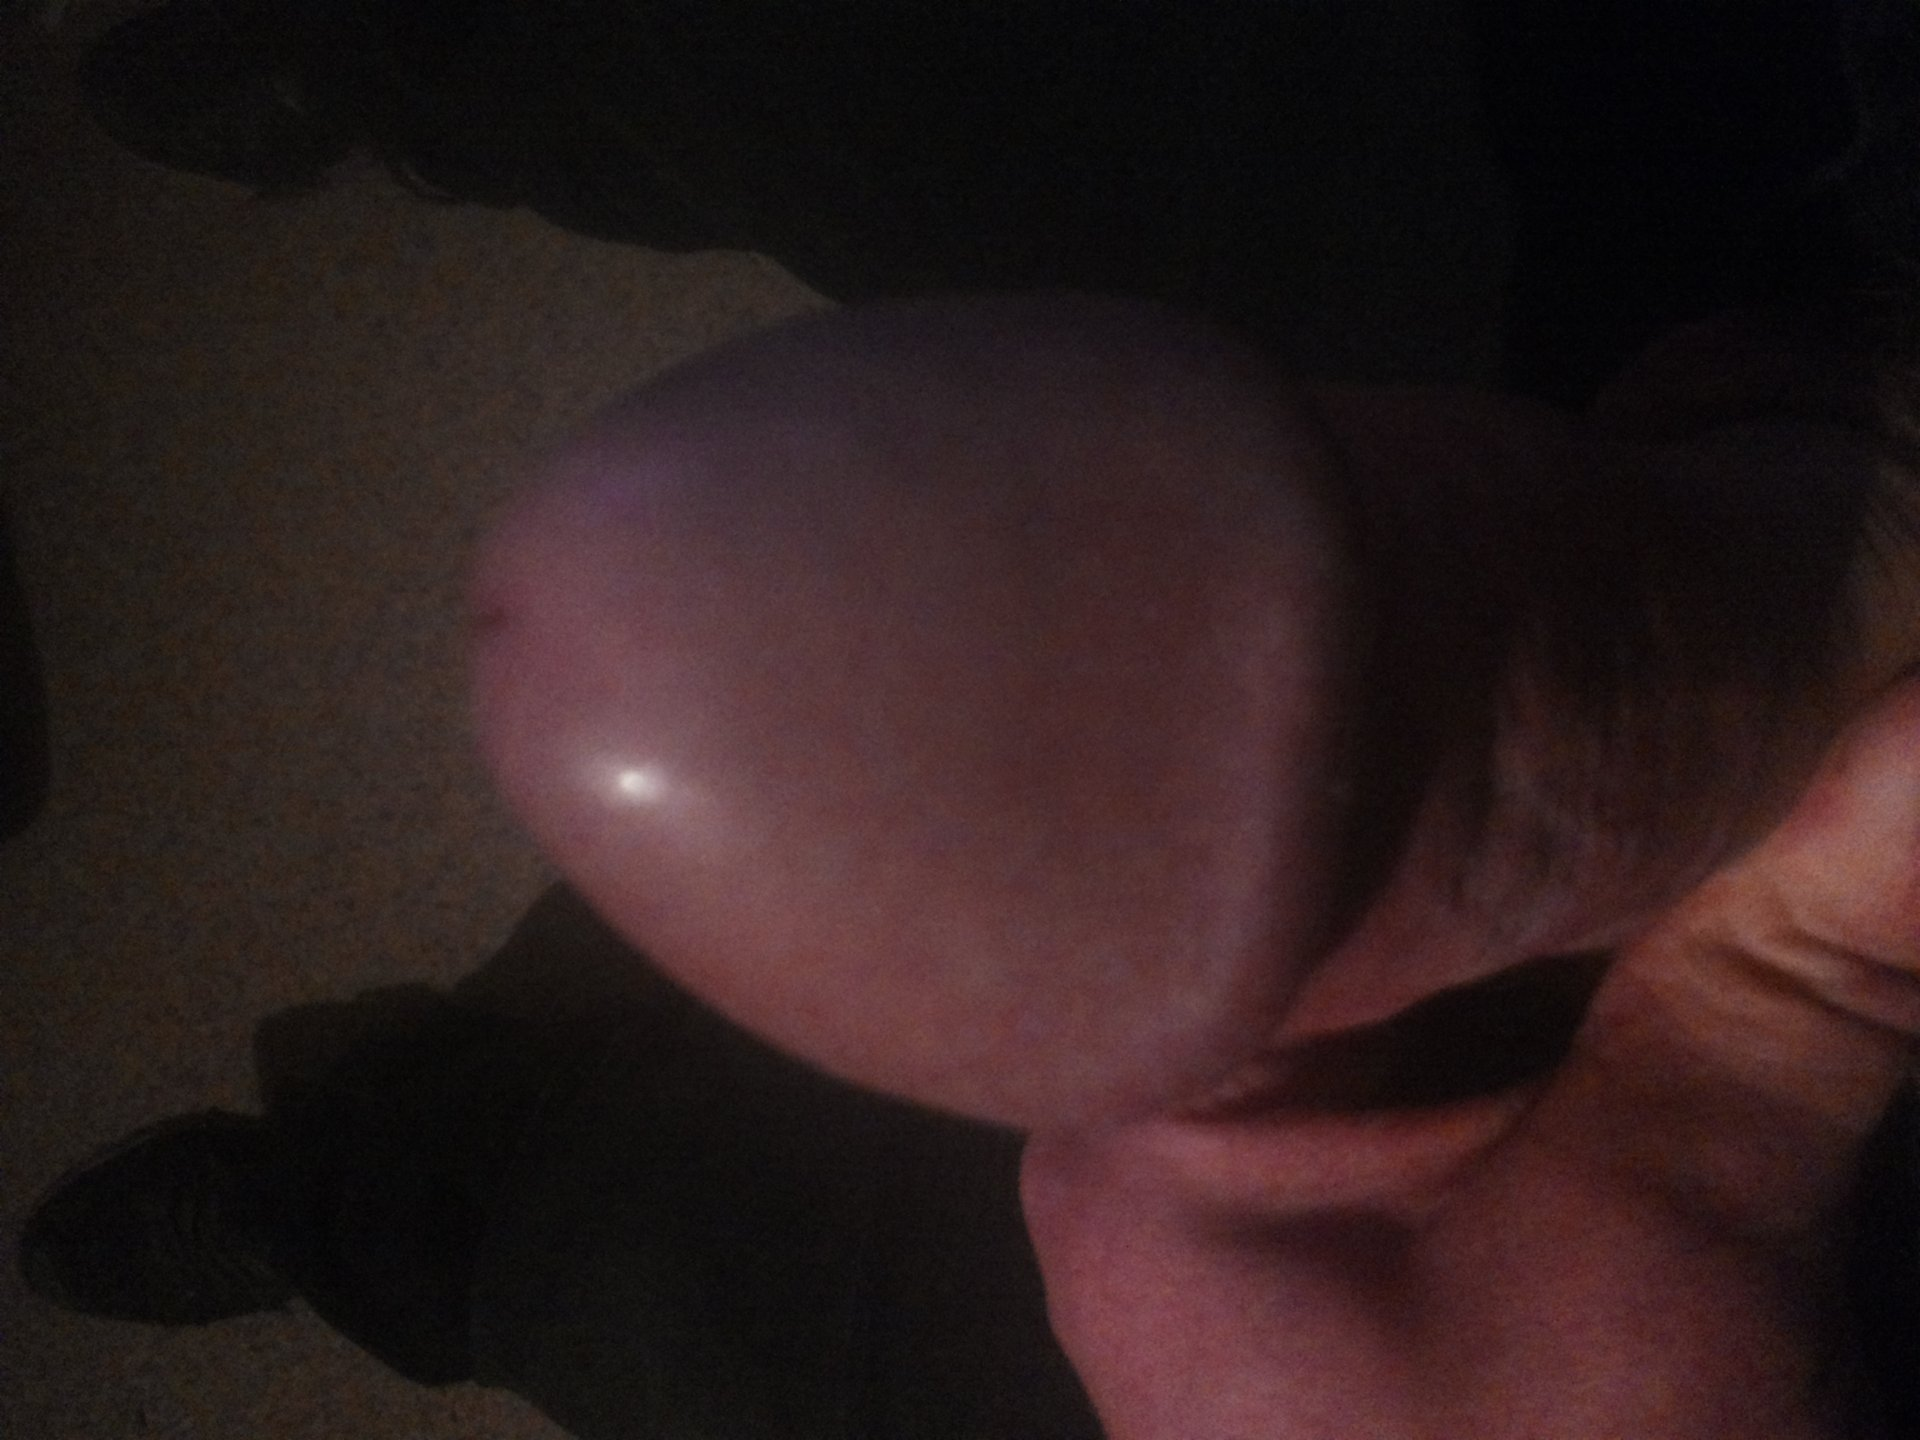 penis will natte kutje 2 uit Gelderland,Nederland